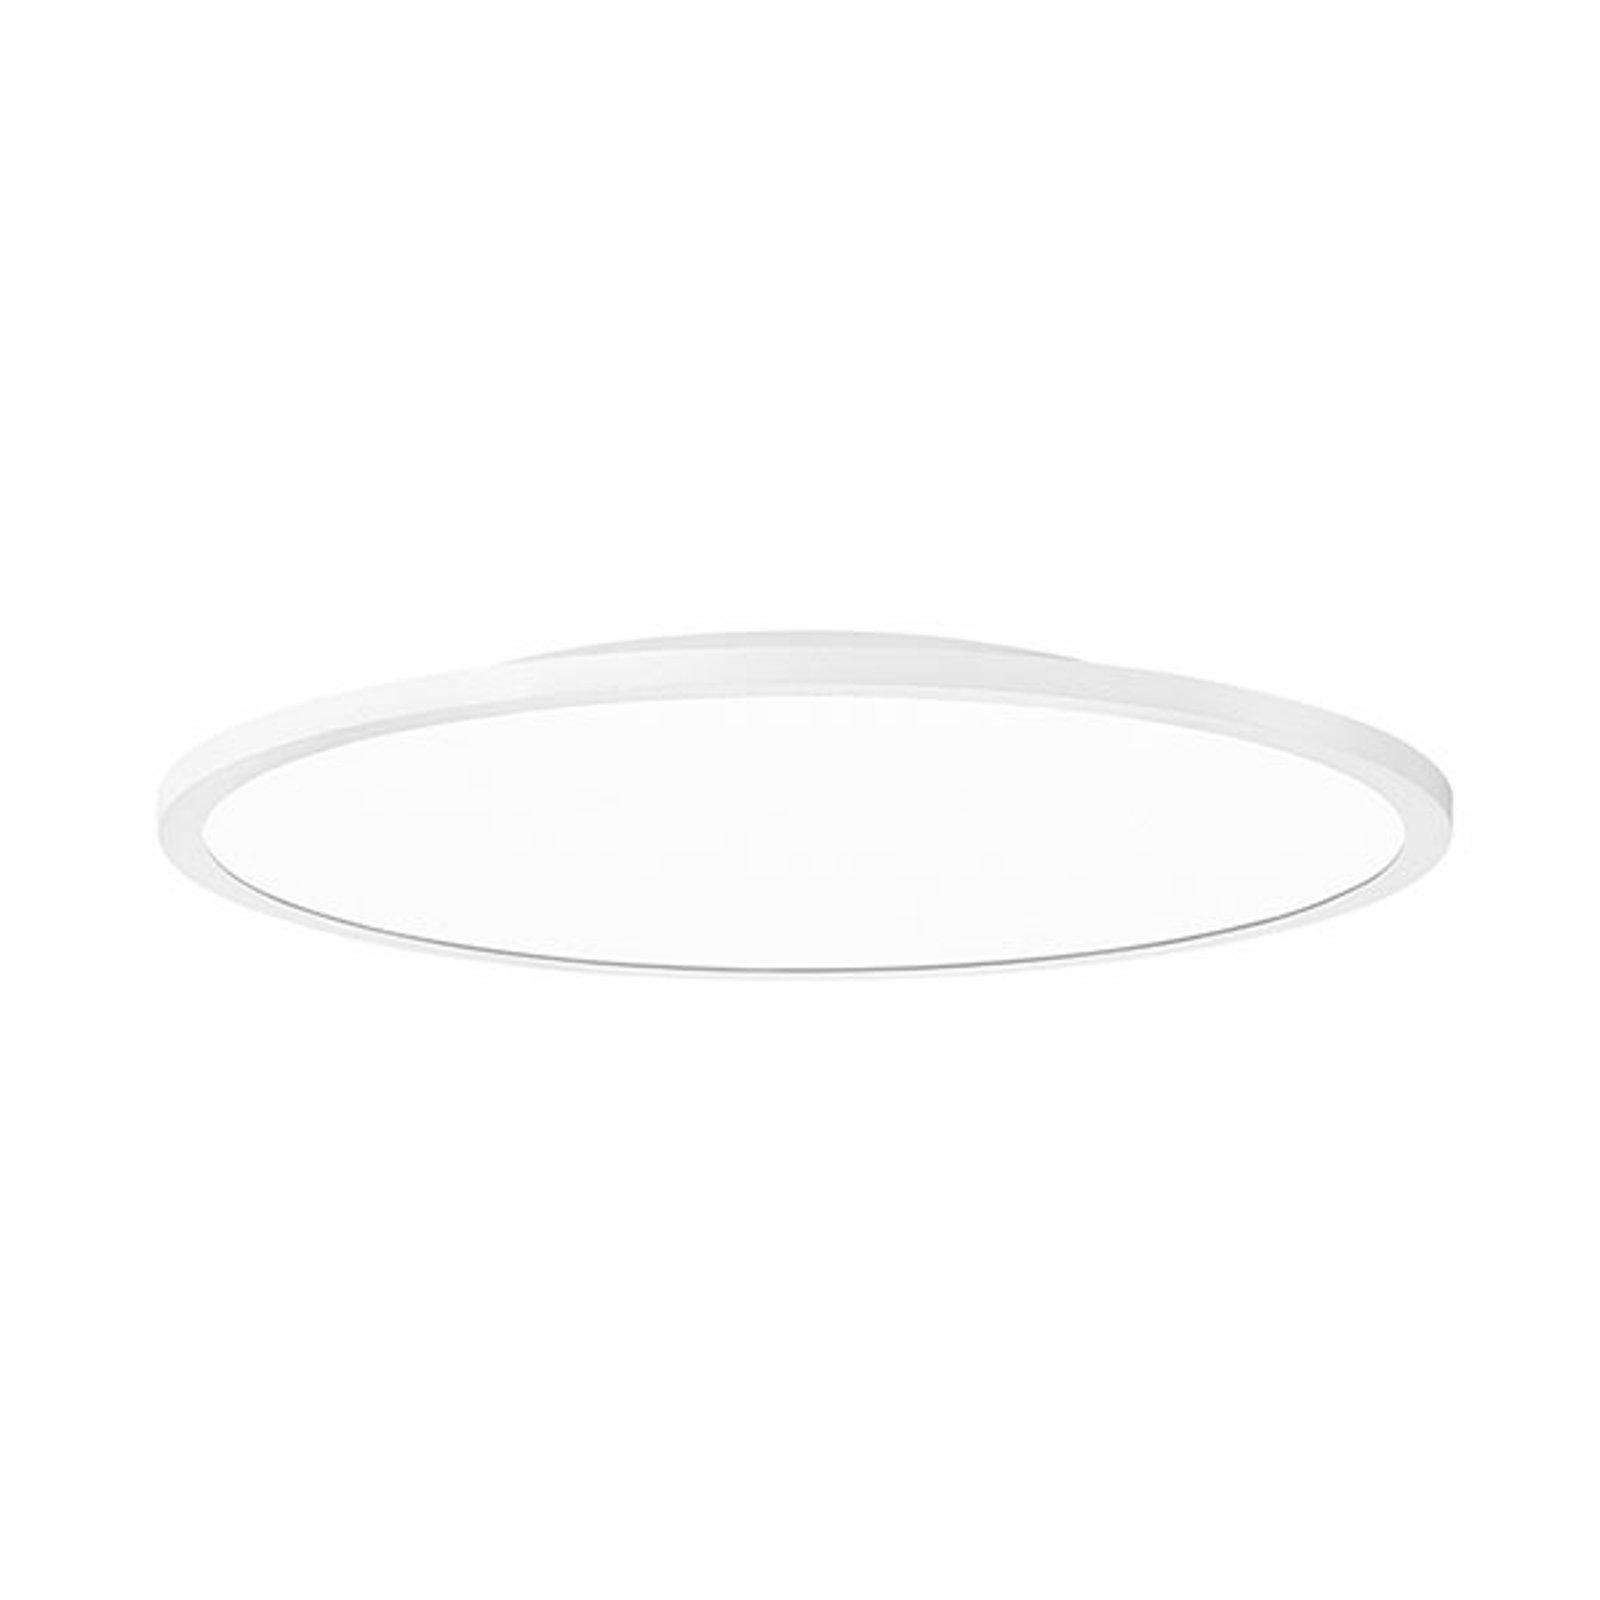 LED-taklampe FL555AB Ø55cm DALI 6500lm 4 000 K